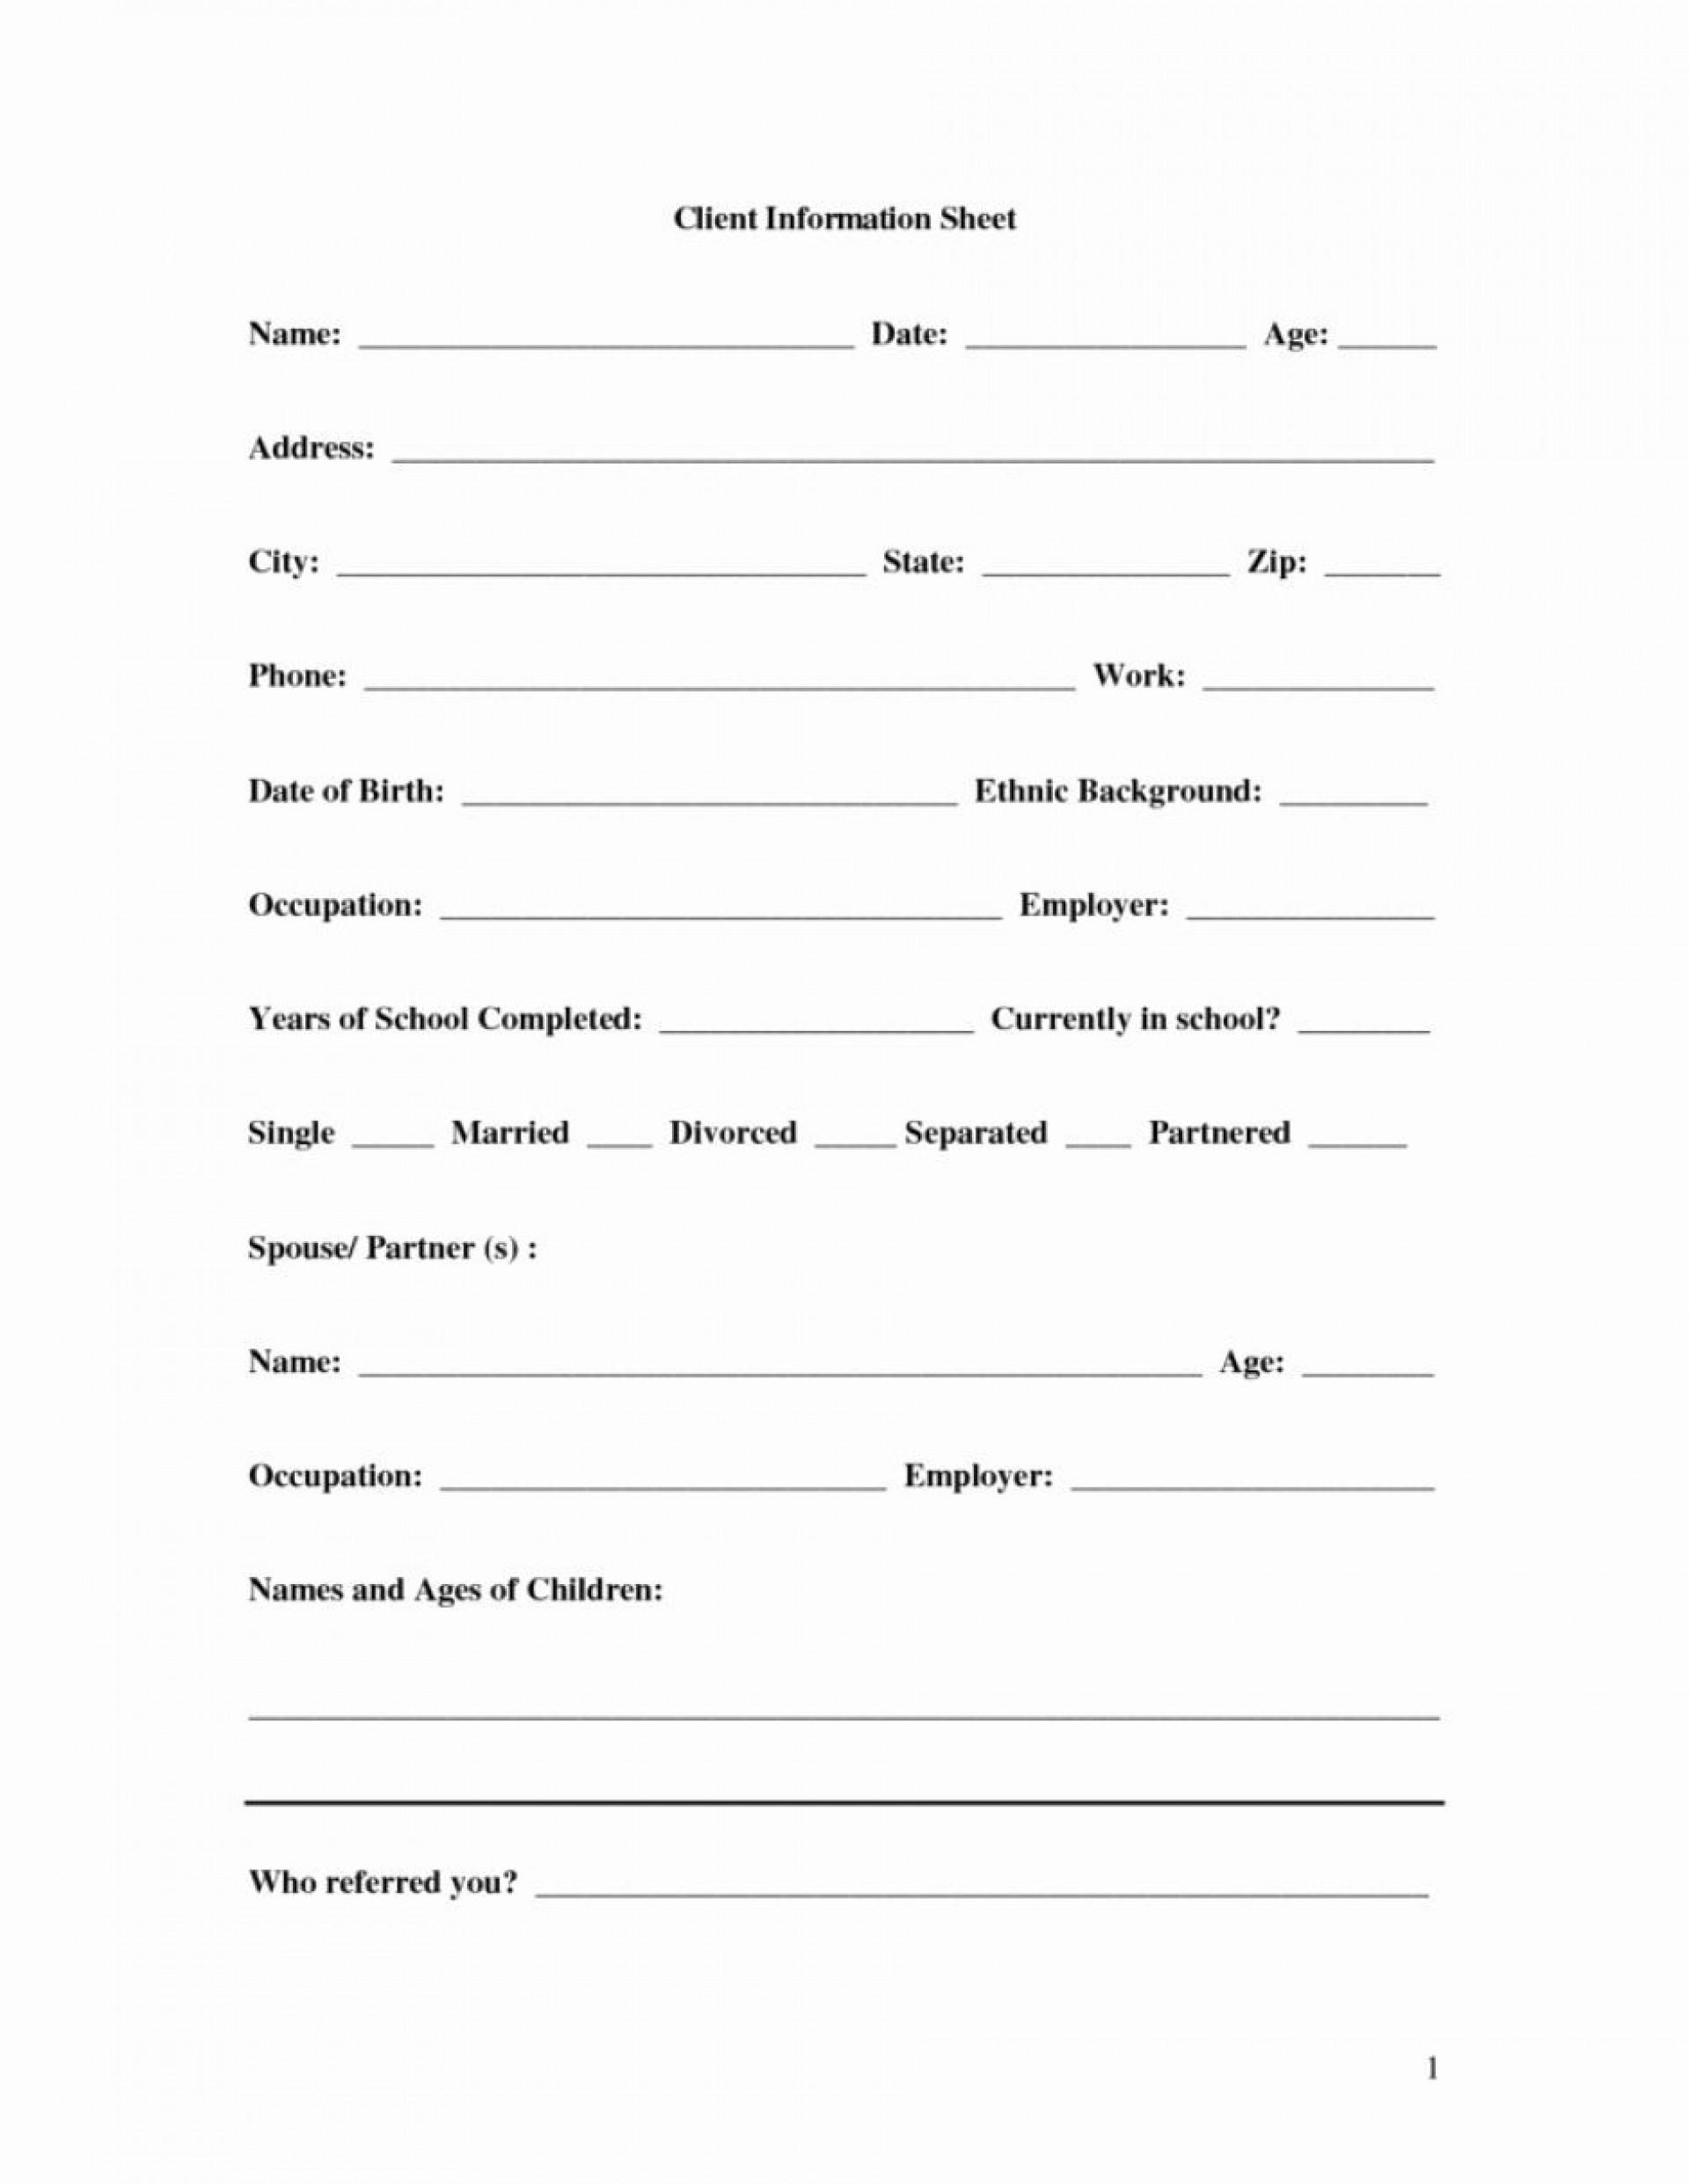 001 Unbelievable Client Information Form Template Excel Highest Clarity 1920